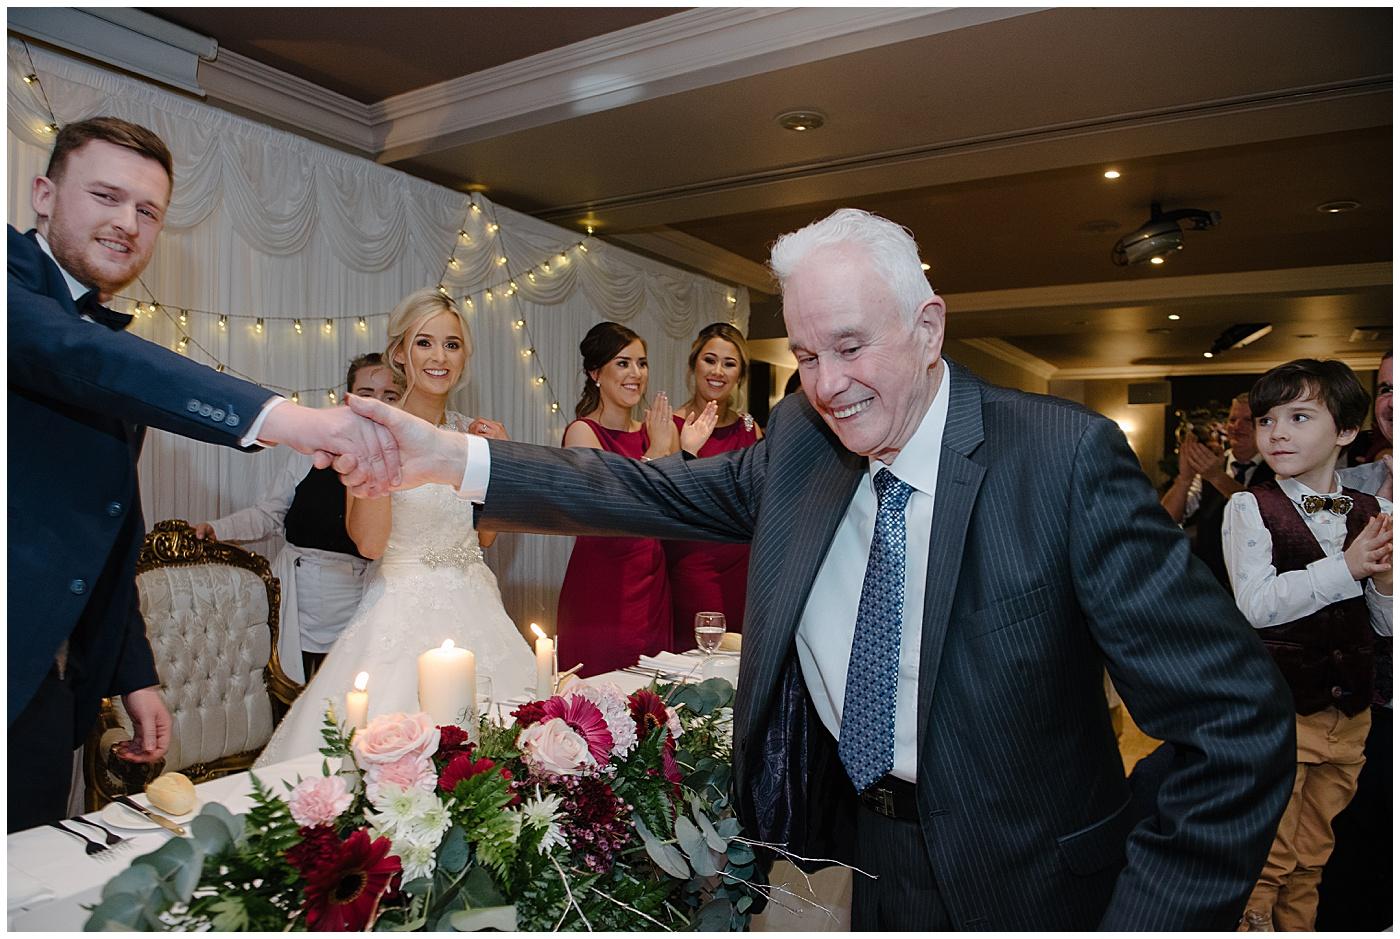 lissan-house-wedding-jude-browne-photography_0108.jpg